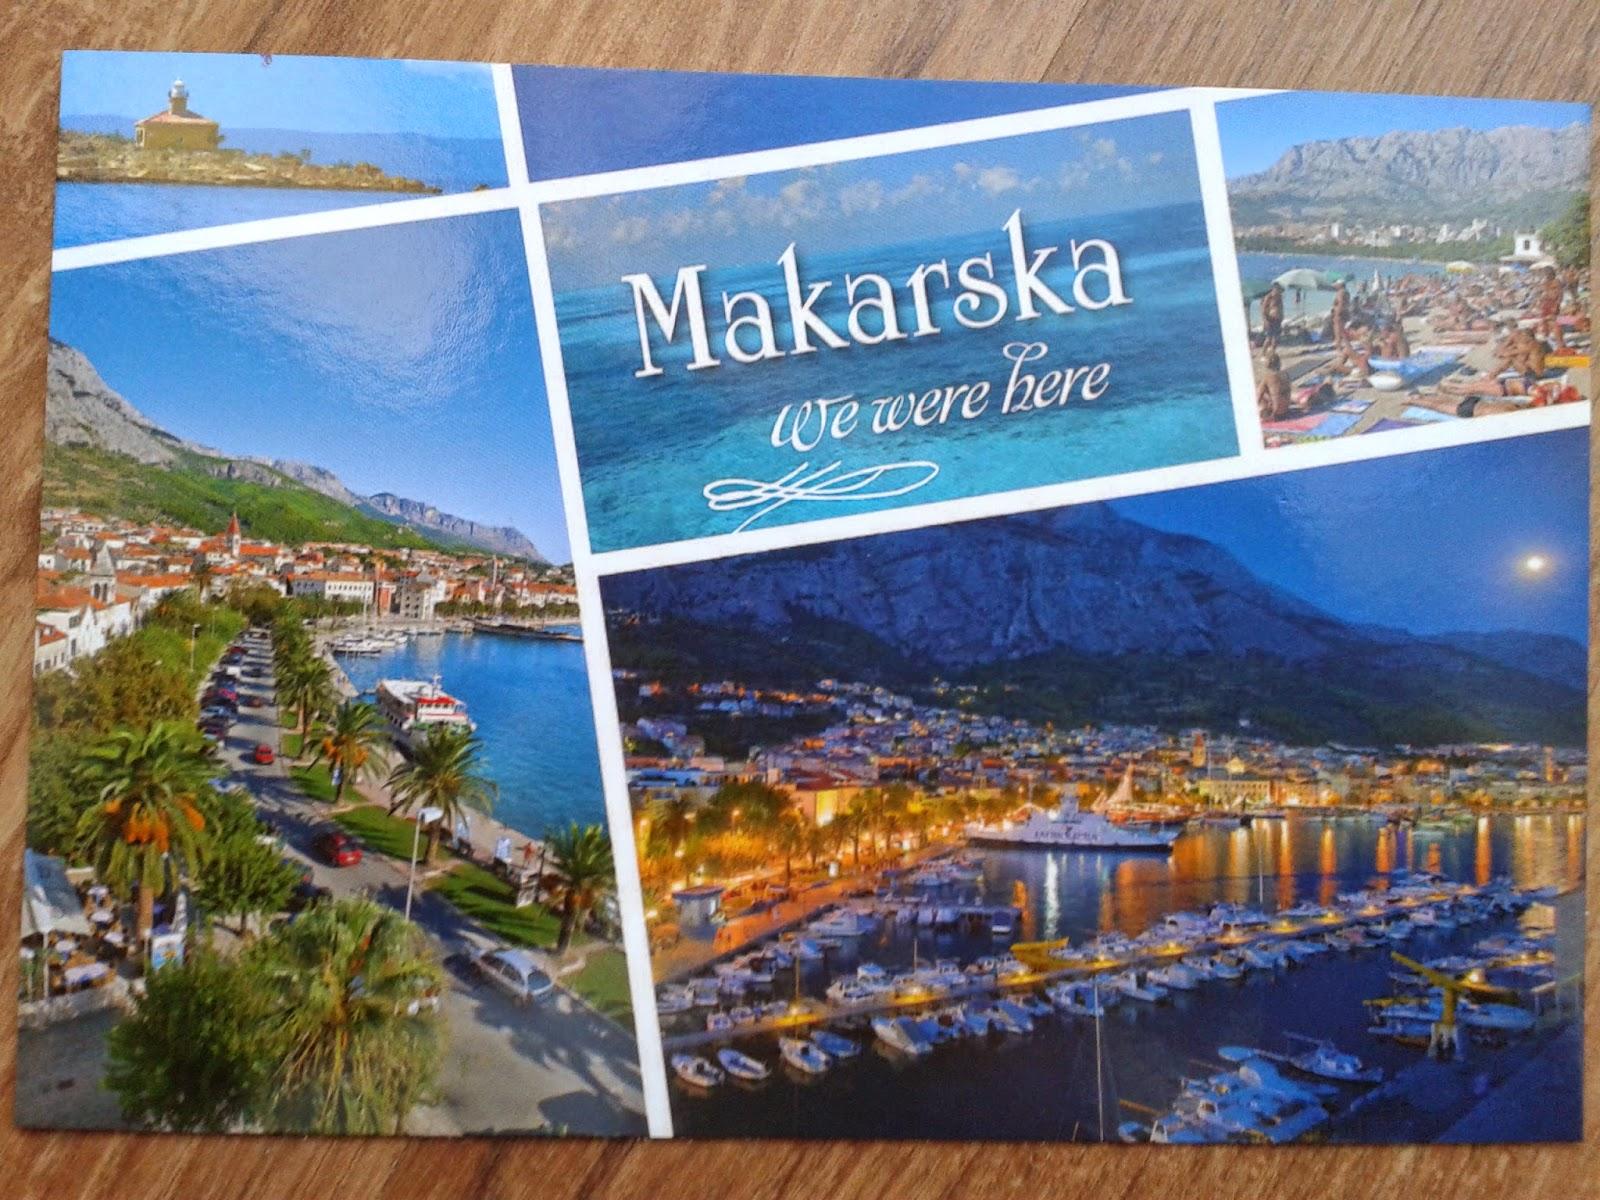 Chorwacja noclegi nad morzem 7 dni na turnusy rehabilitacyjne